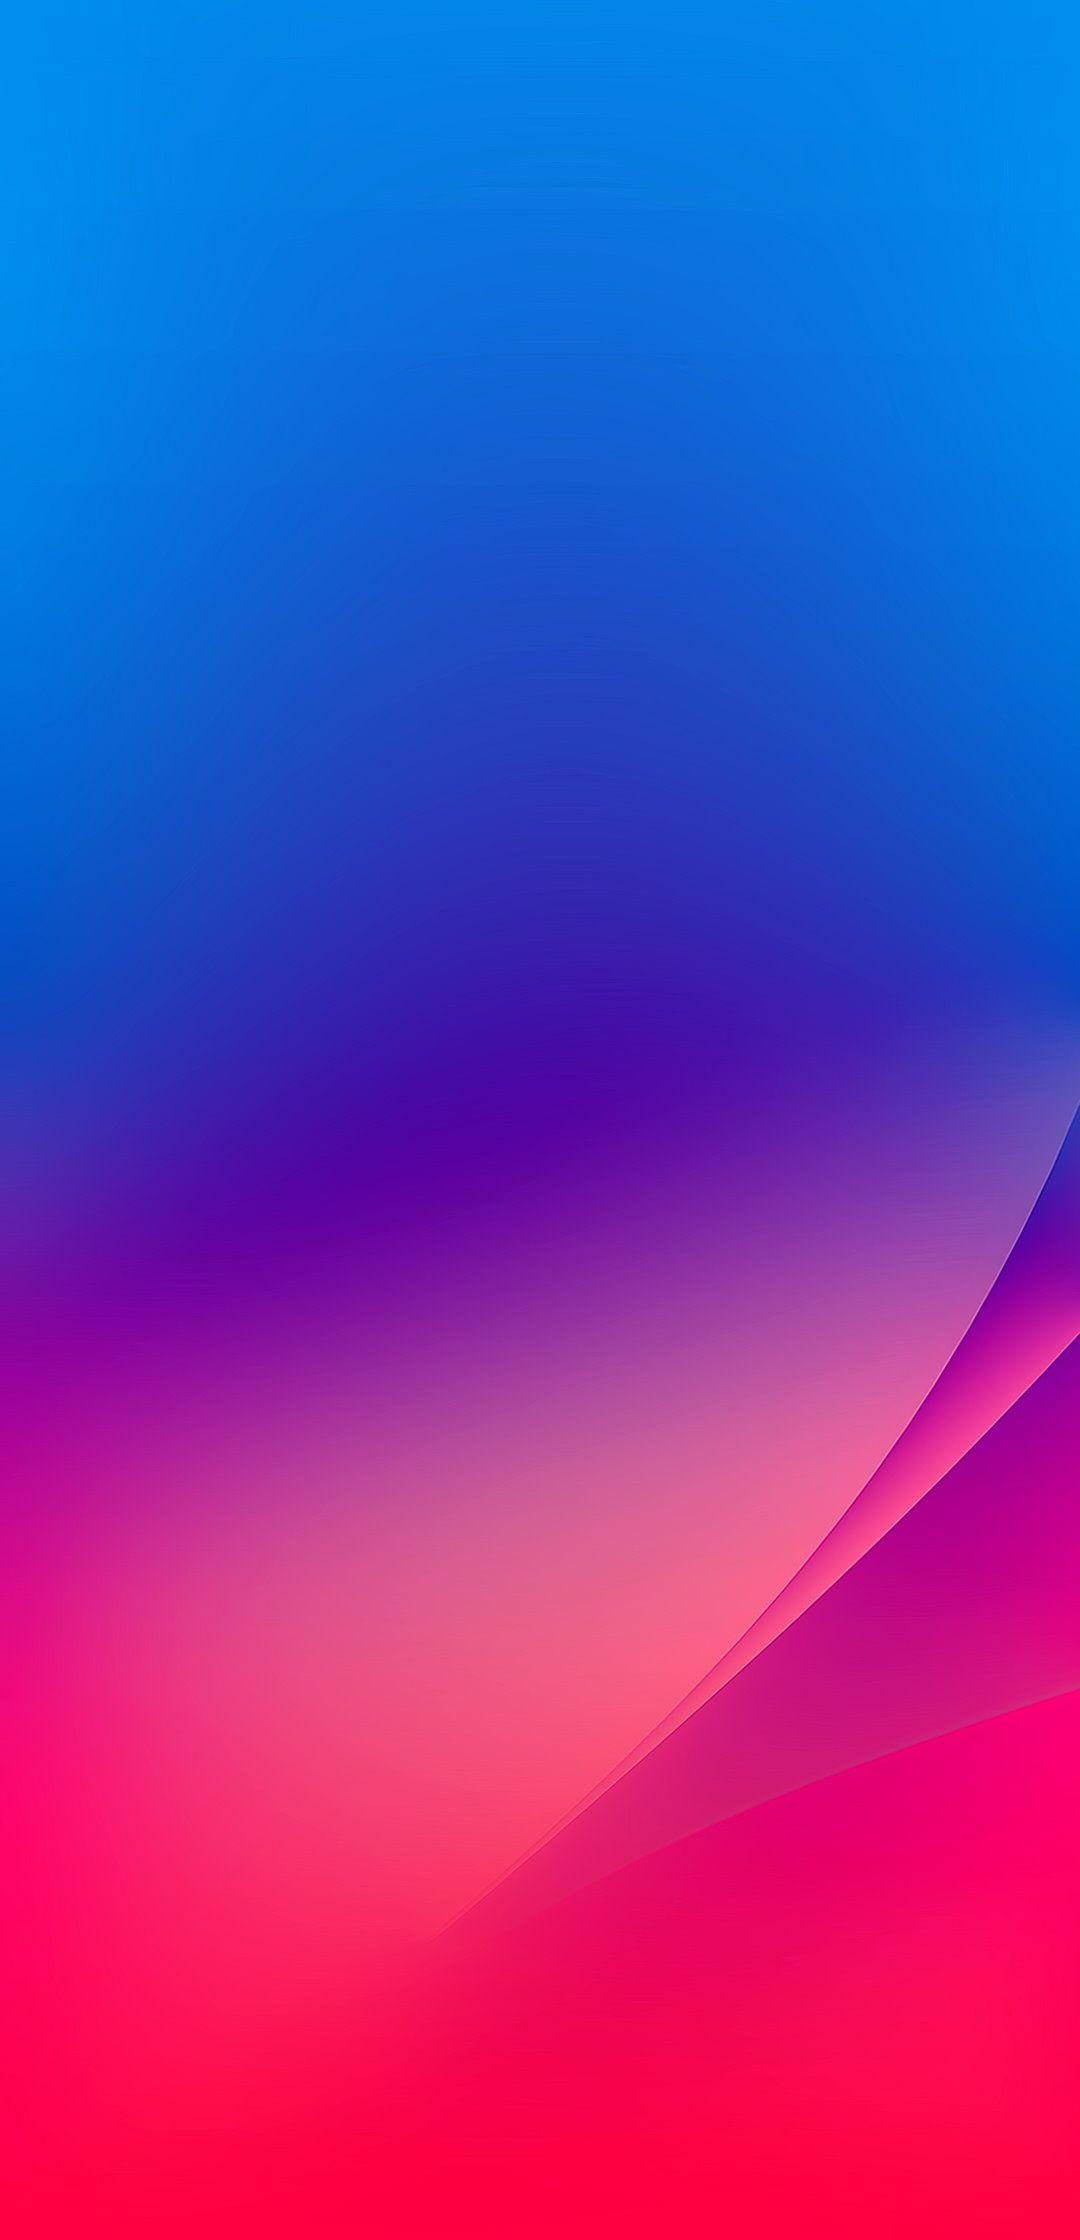 Wallpapers Huawei P20 Pro Pack 8 Fond D Ecran Telephone Fond D Ecran Android Fond D Ecran Colore